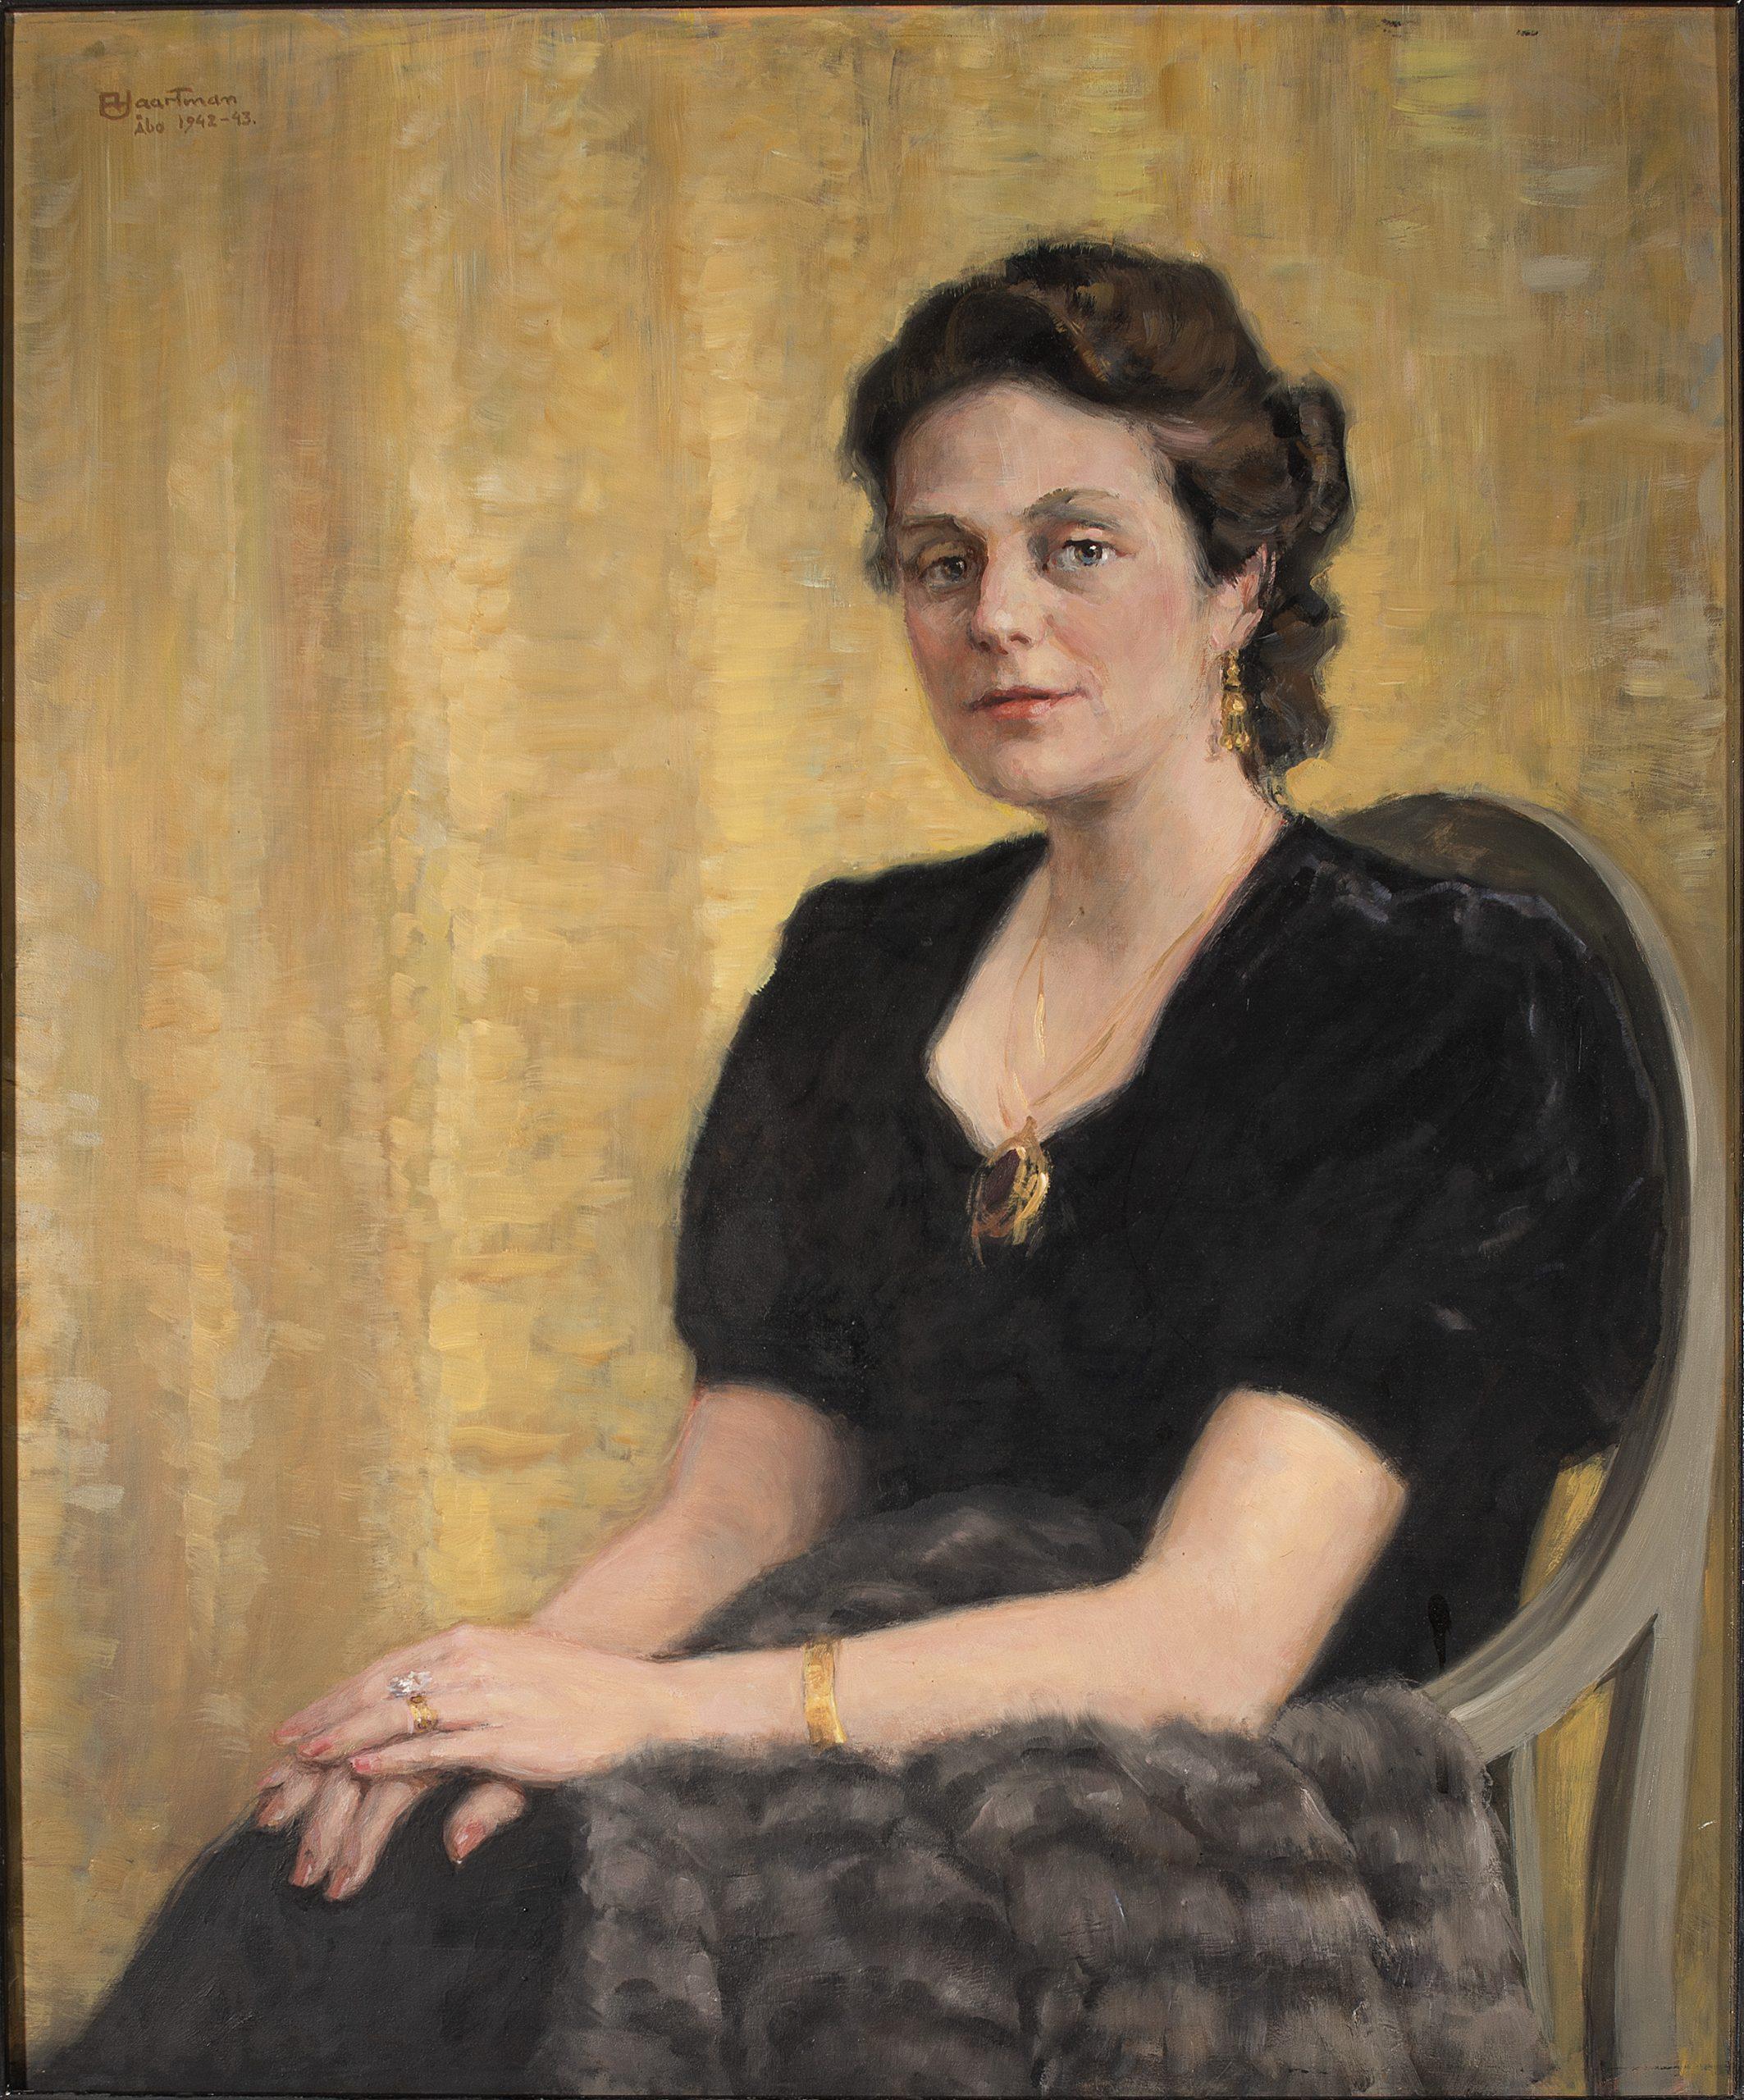 Haartman Axel Irma Furstenborg-Hannelius f. Streng,1942-43 Olja på skiva